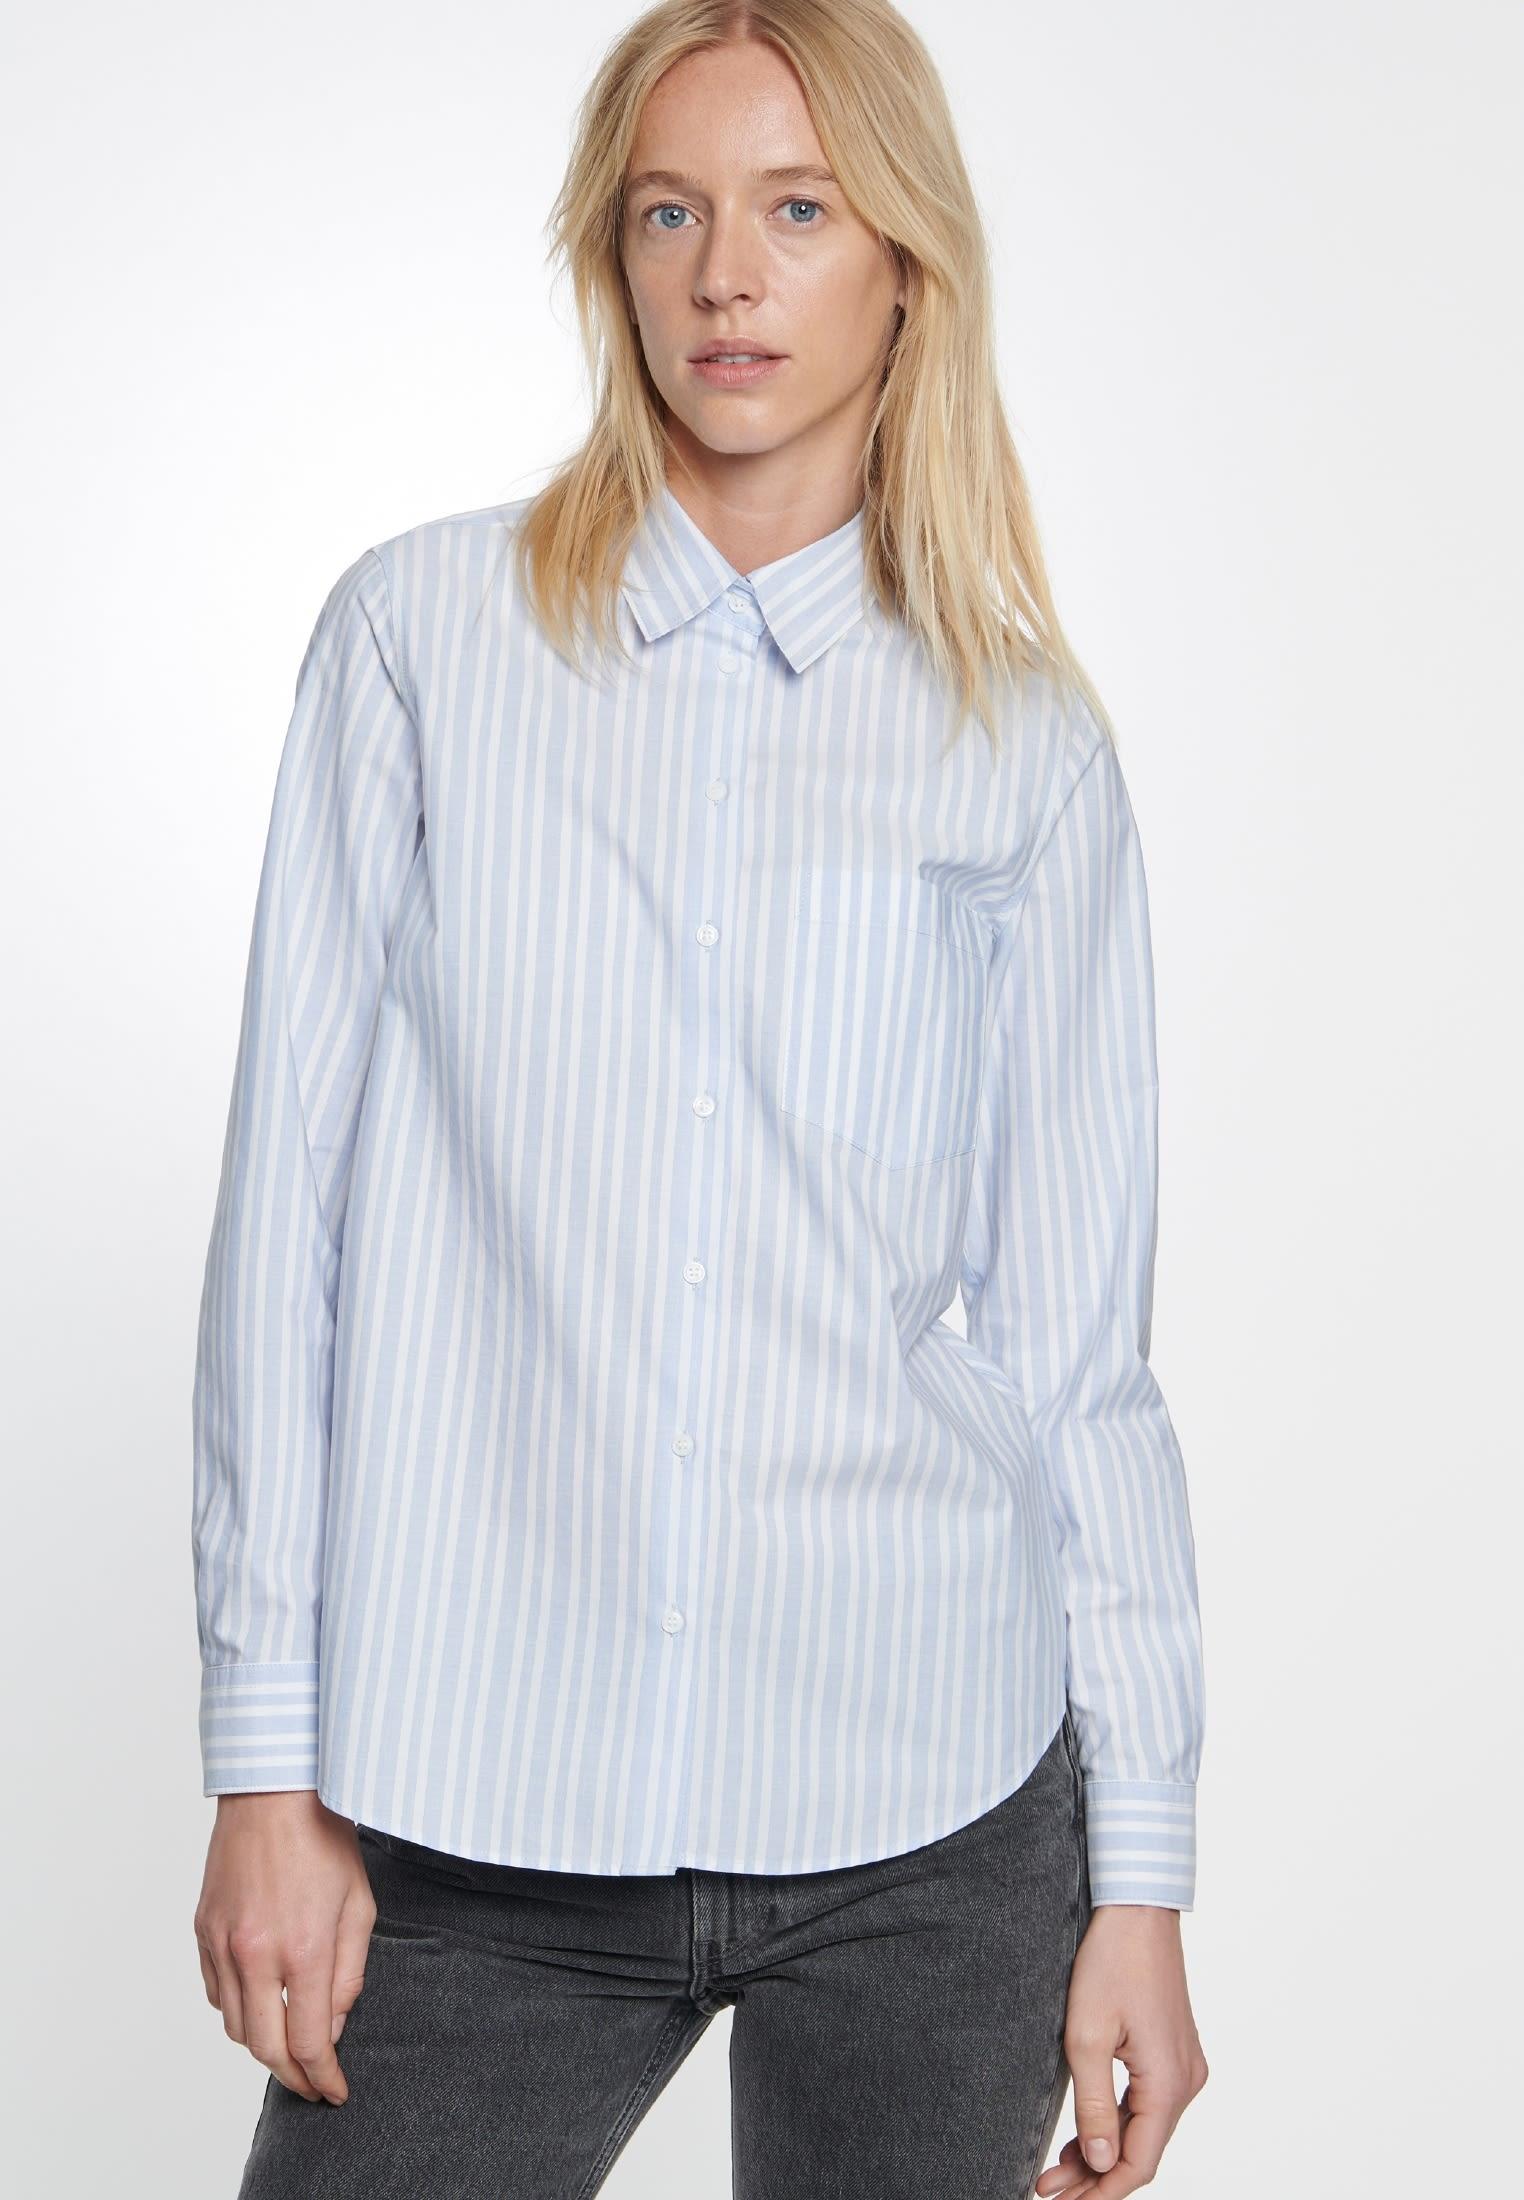 Fil a fil Shirt Blouse made of 100% Cotton in blau-weiß |  Seidensticker Onlineshop